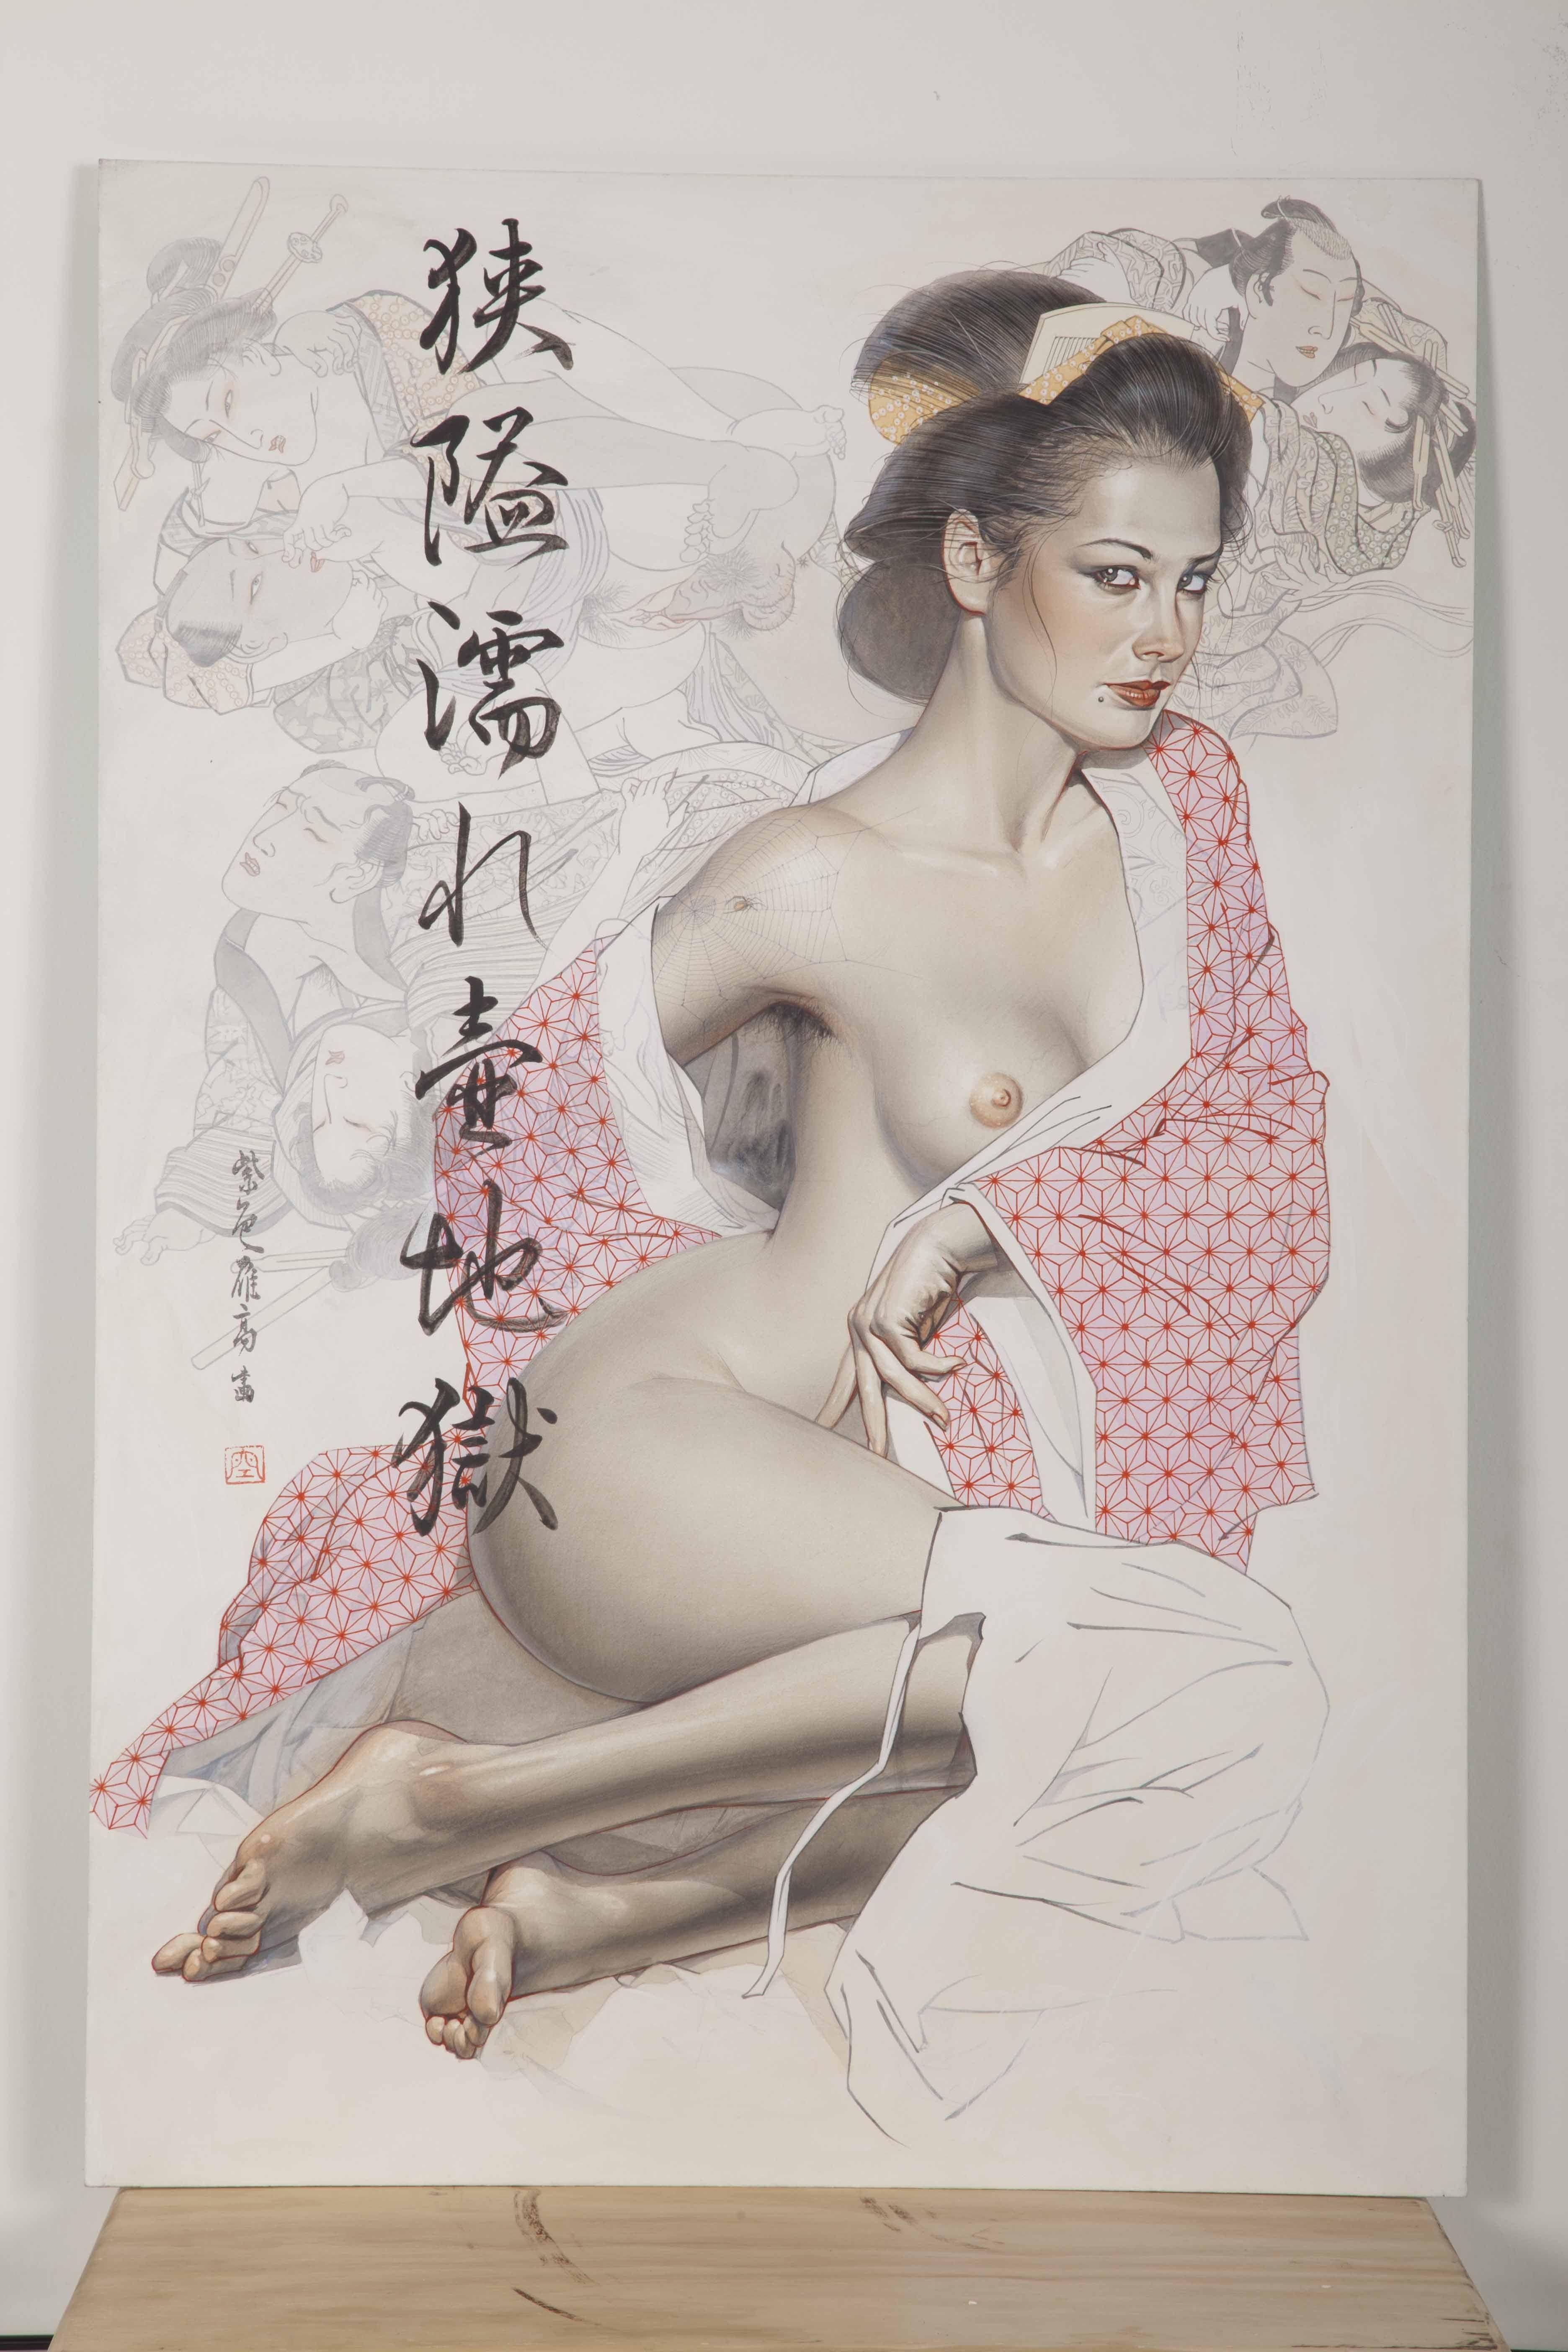 Erotic Art Book Uncensored